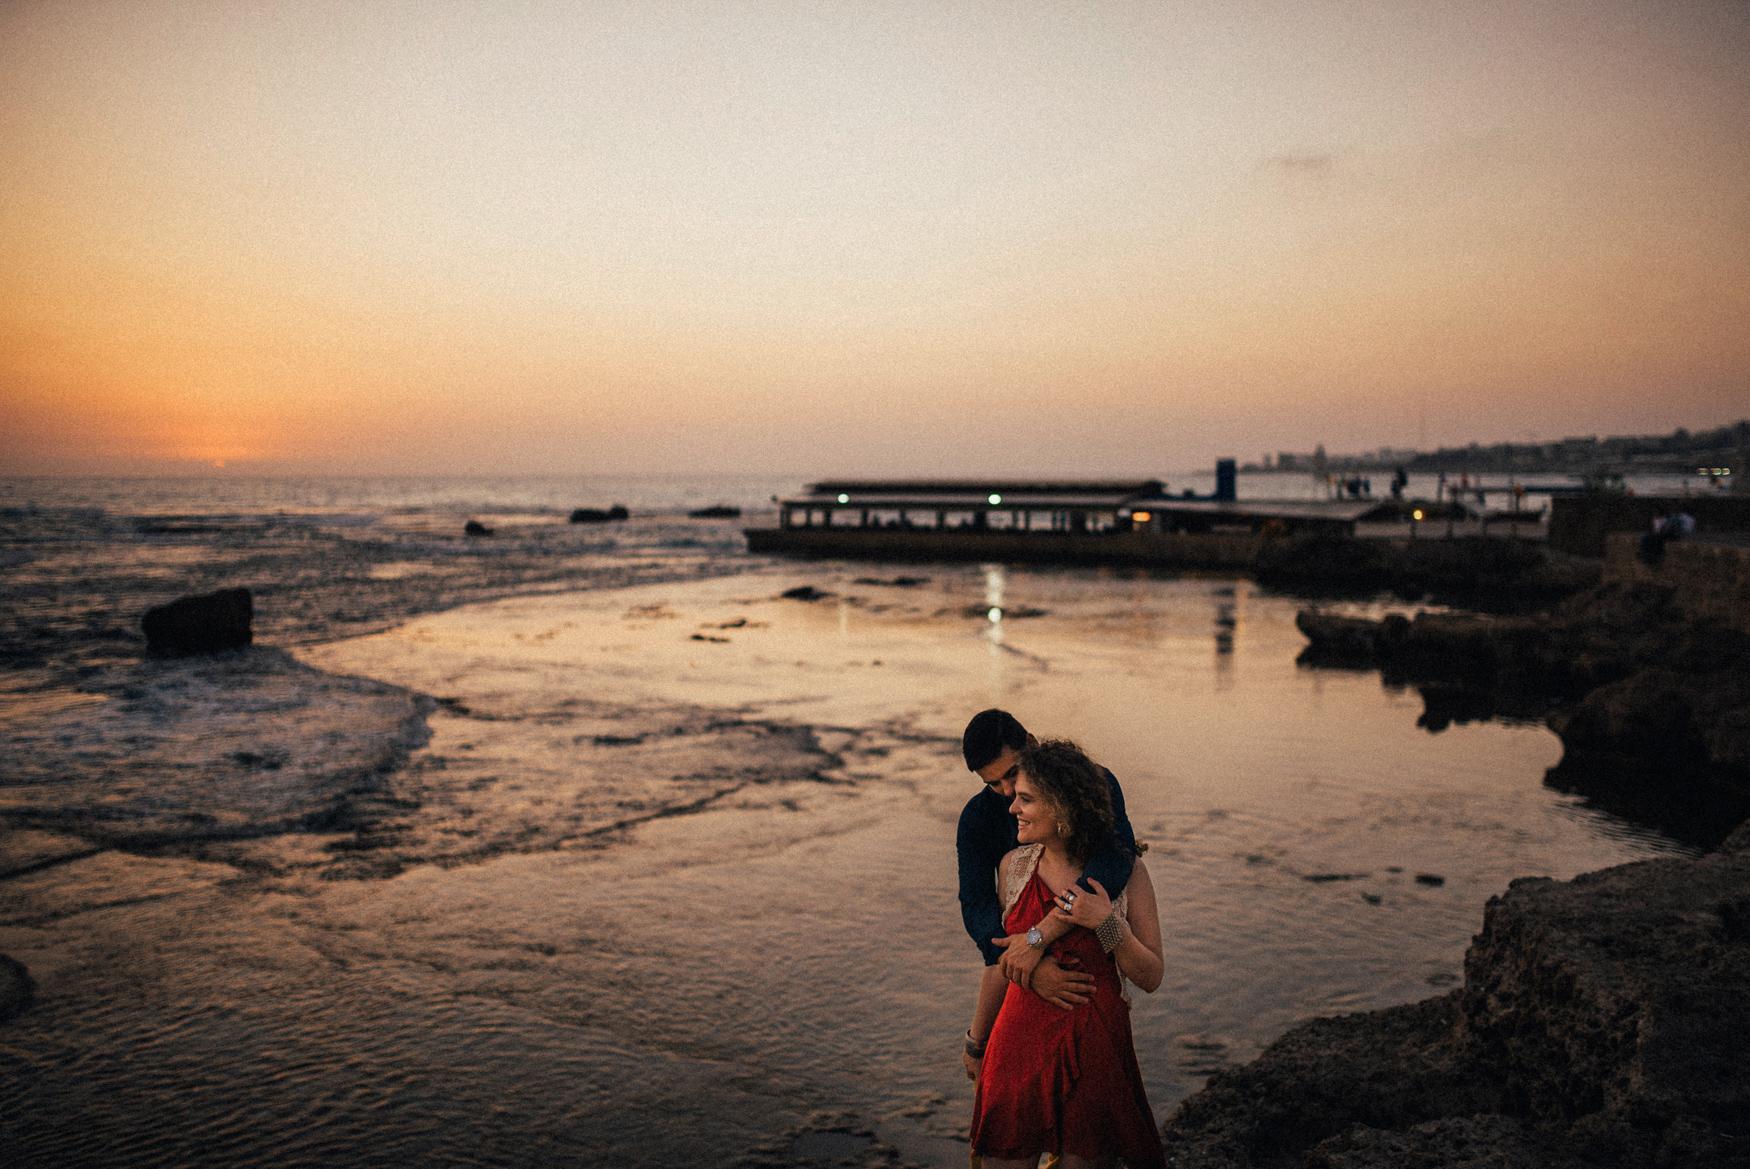 LR1 byblos beirut wedding photographer lebanon 017.jpg